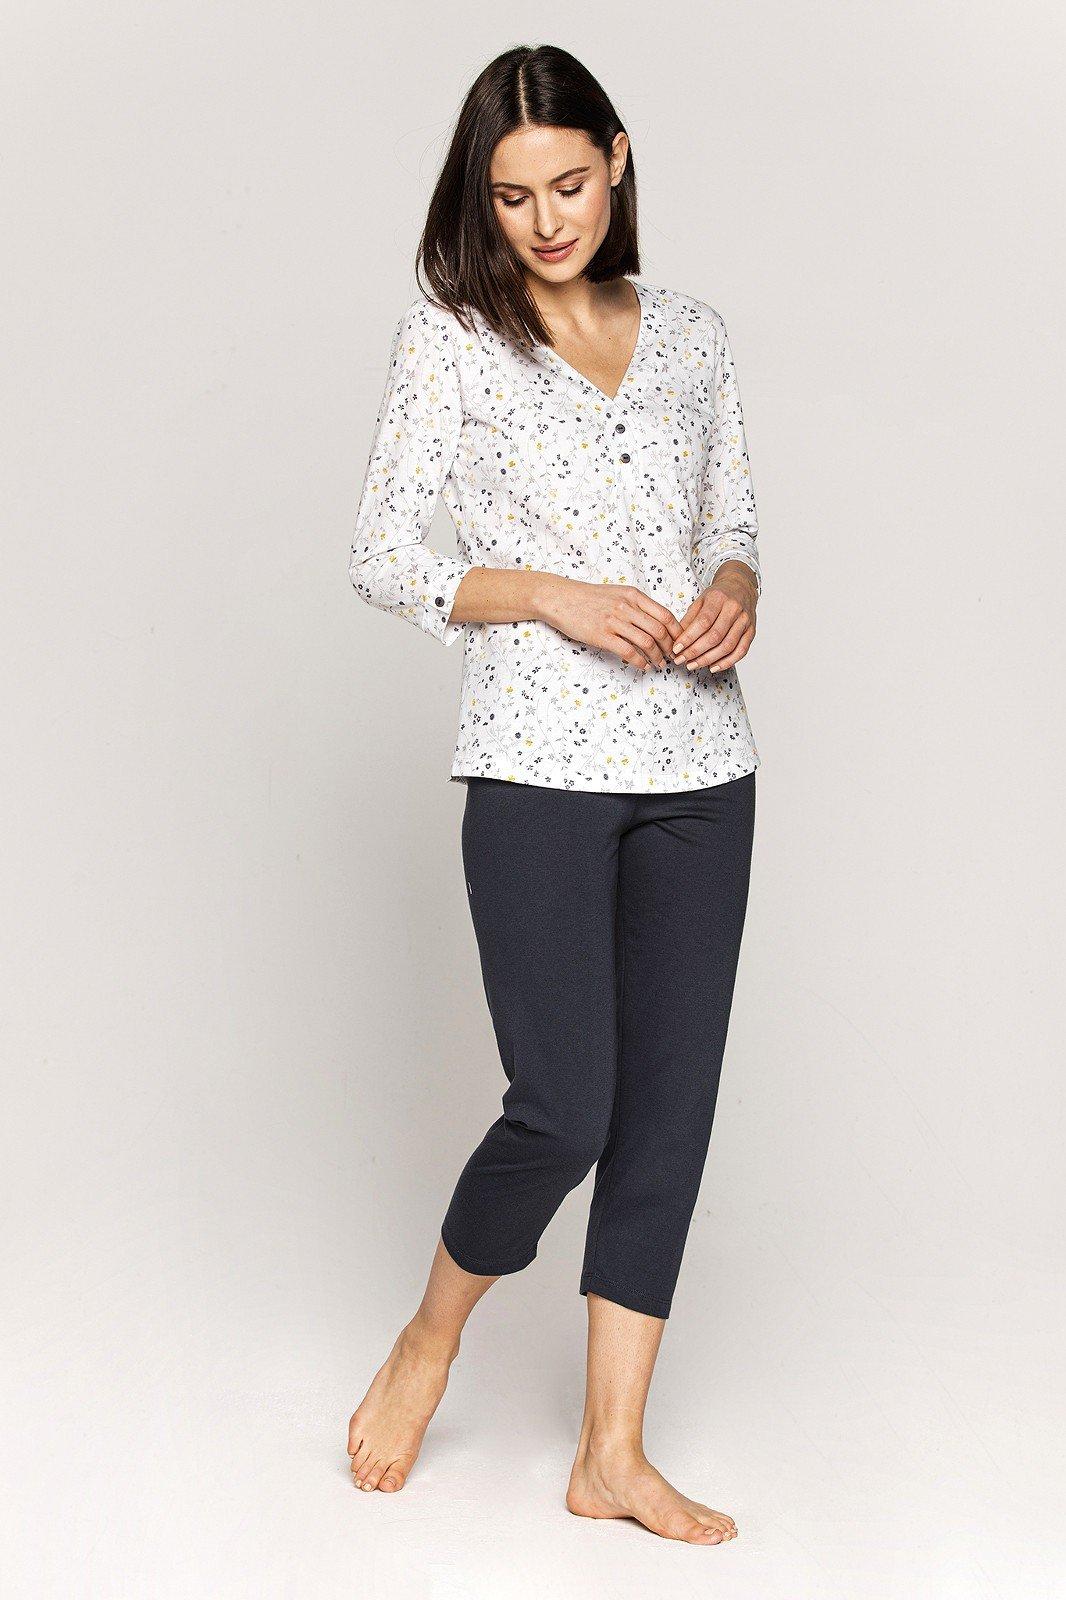 Piżama Cana Damska 555 3/4 R